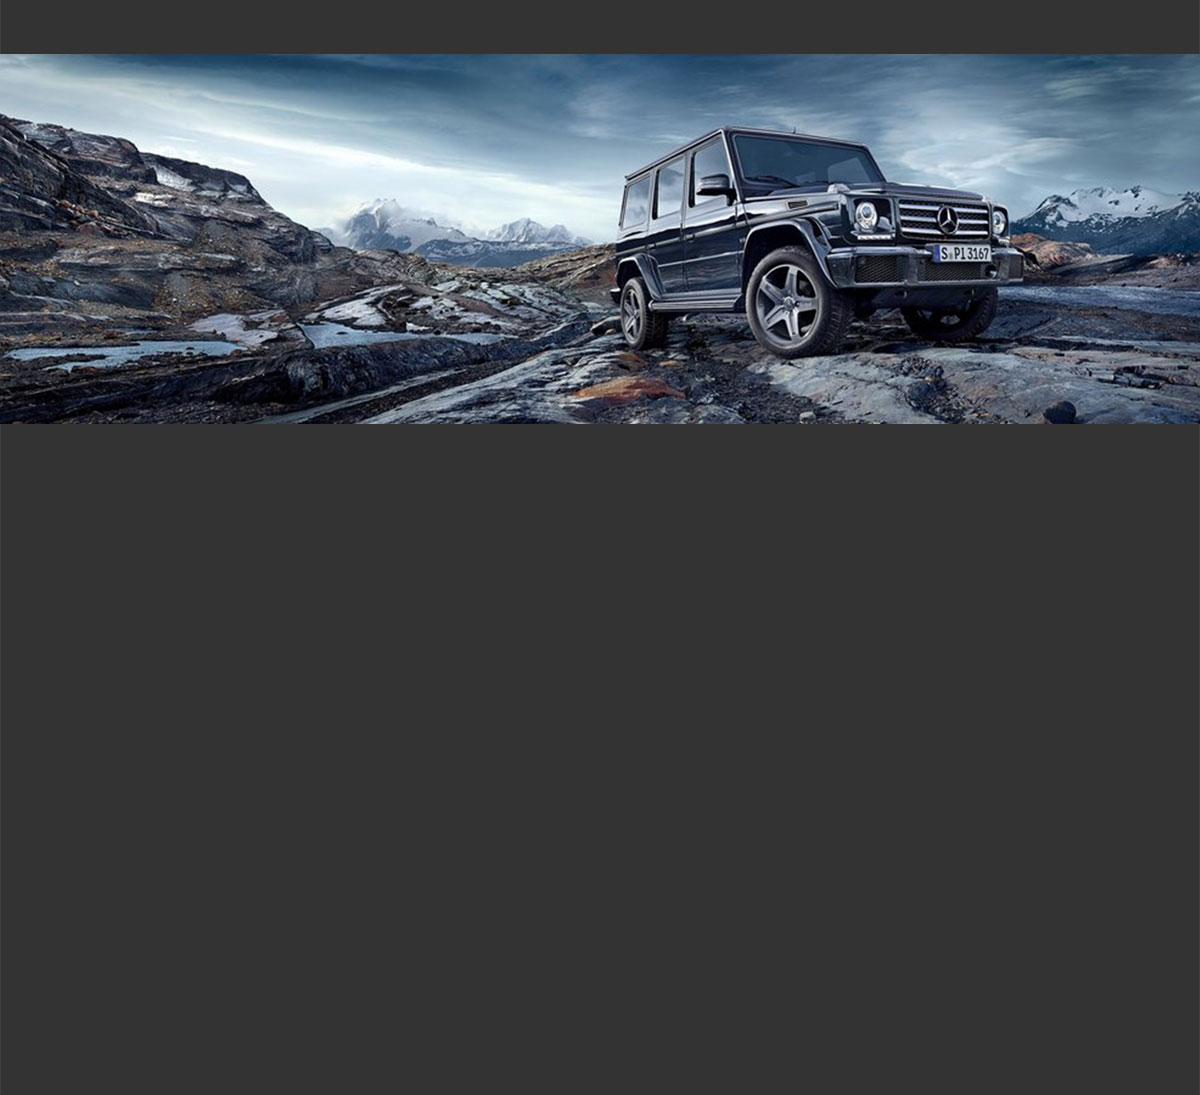 Brietling Financial Auto Used Cars Detroit Mi Dealer